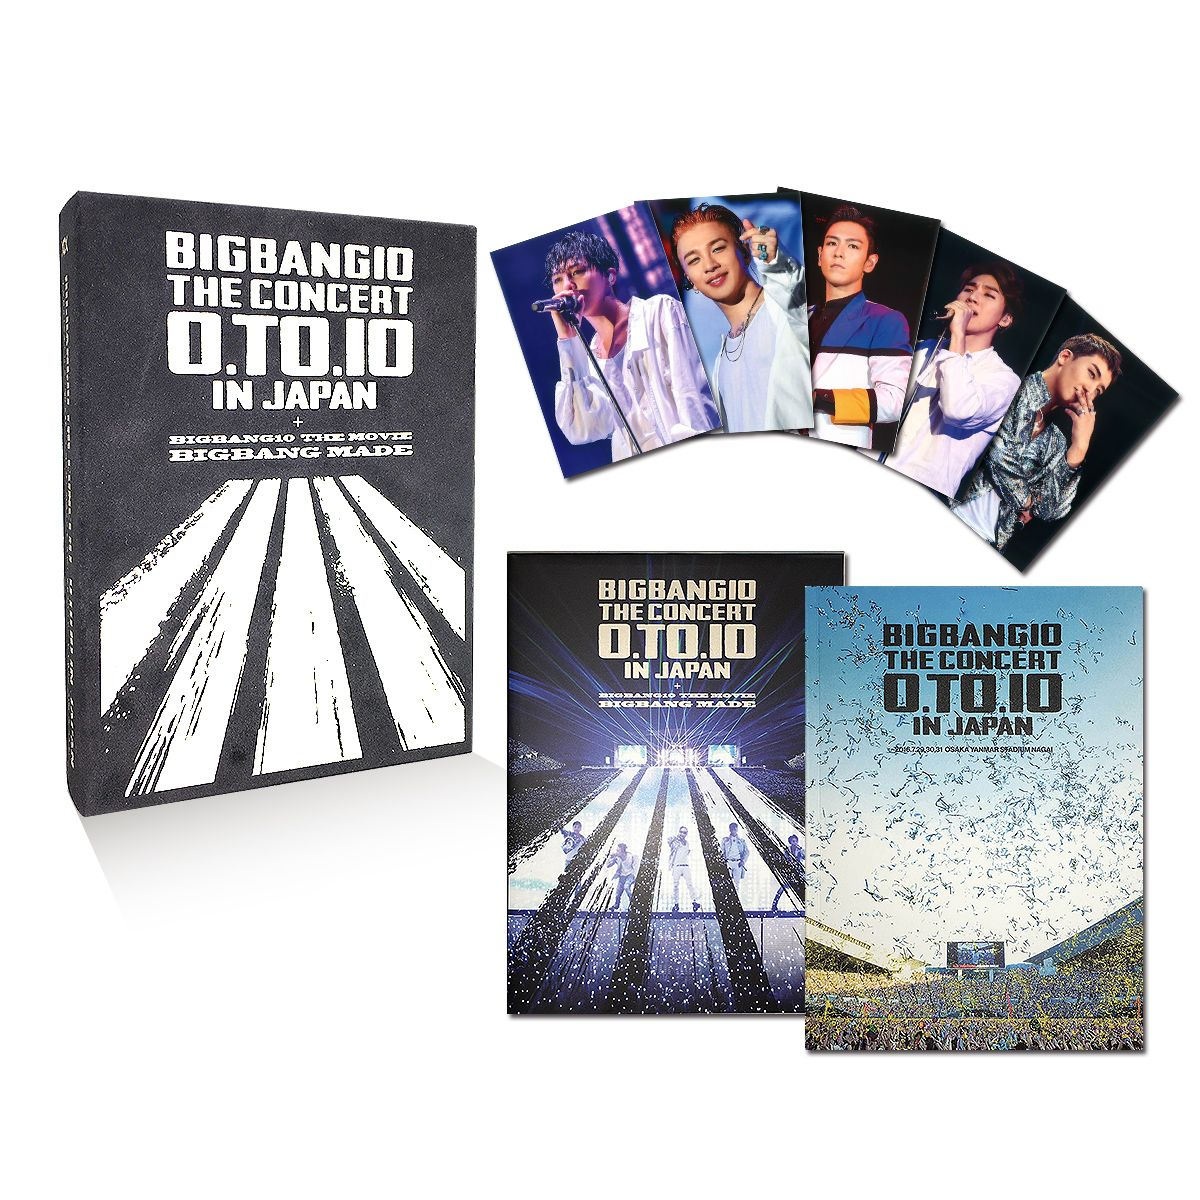 BIGBANG10 THE CONCERT : 0.TO.10 IN JAPAN + BIGBANG10 THE MOVIE BIGBANG MADE[DVD(4枚組)+LIVE CD(2枚組)+PHOTO BOOK+スマプラムービー&ミュージック] -DELUXE EDITION-(初回生産限定) [ BIGBANG ]